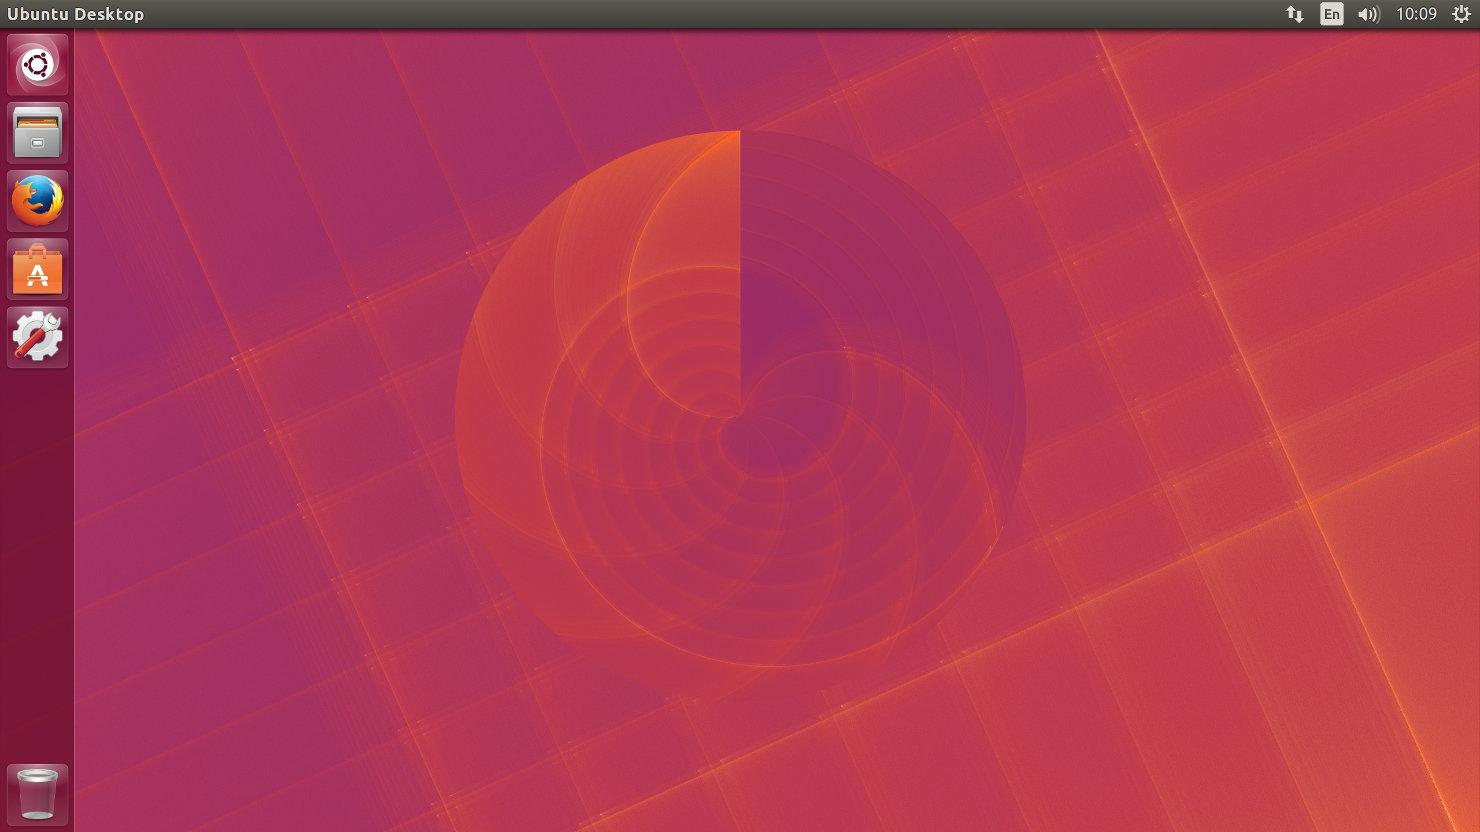 Use Fira Sans as system font on Ubuntu 16 04 - Chi Shang Cheng